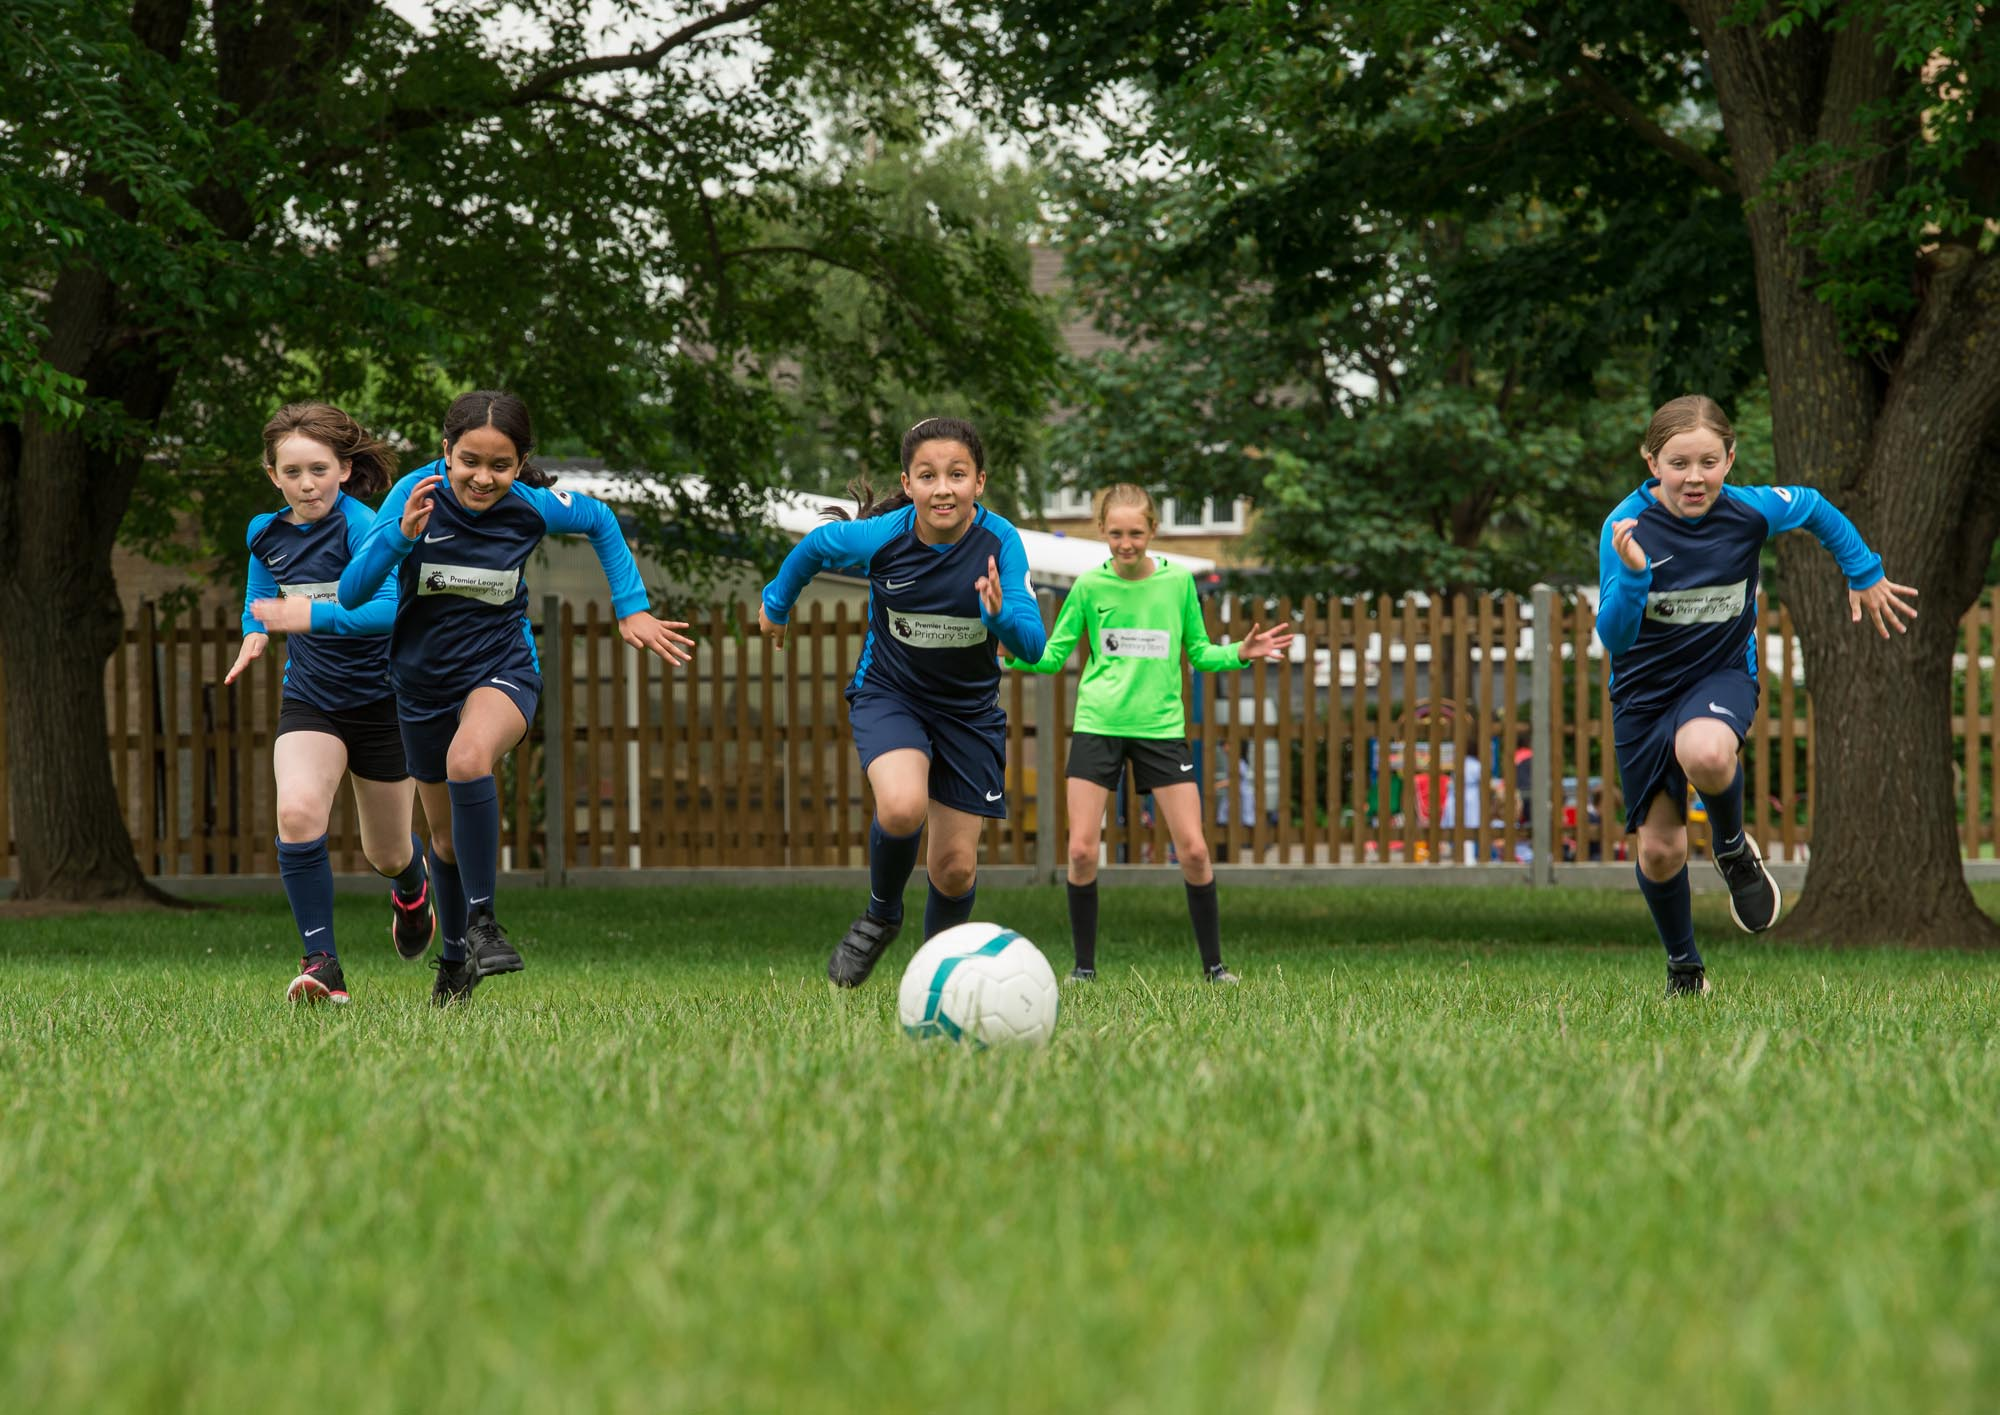 Girls playing football, running towards ball